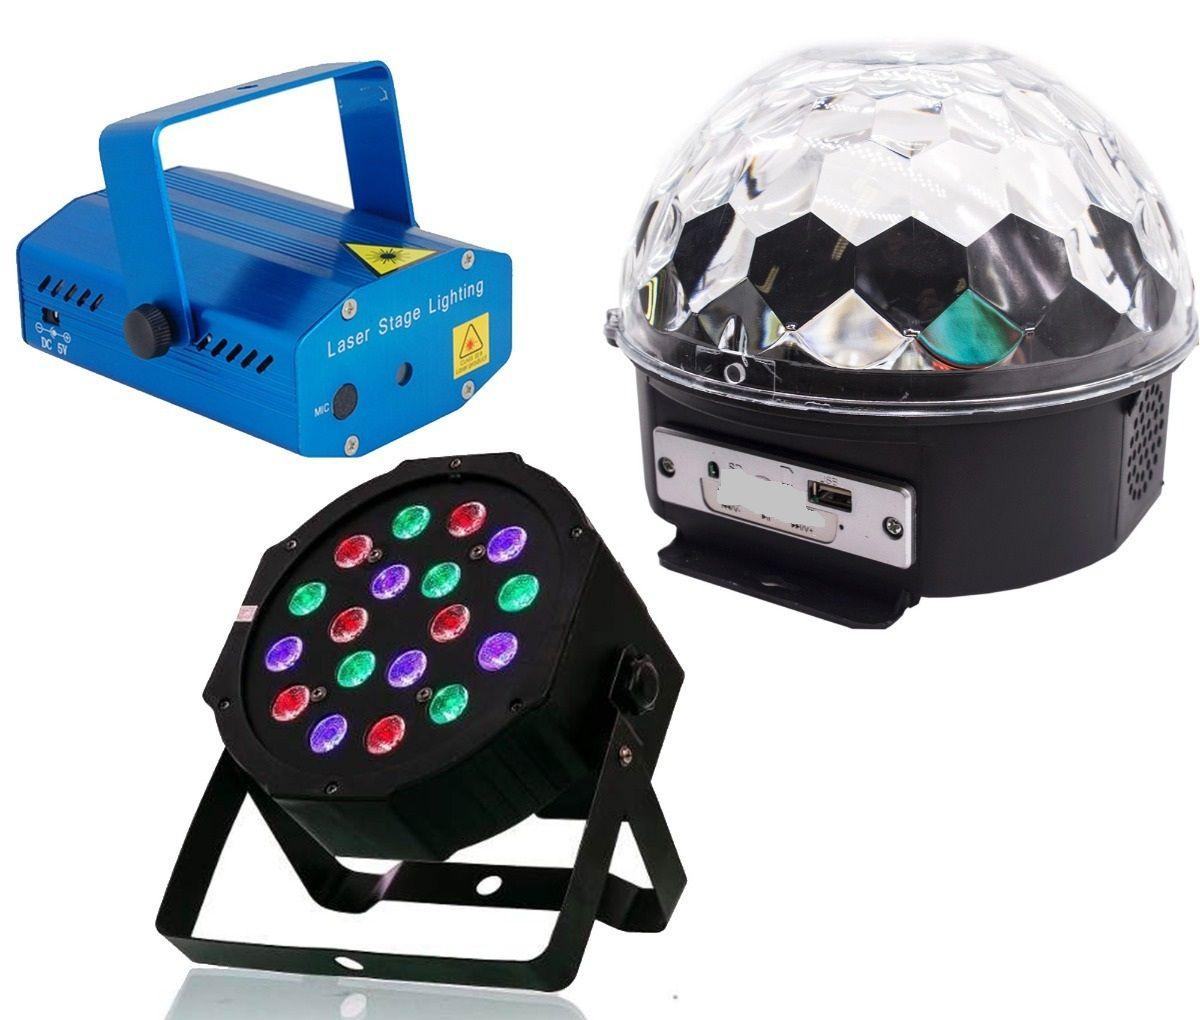 Kit Festa Iluminação Jogo de Luz Dj Festa Balada Strobo Laser